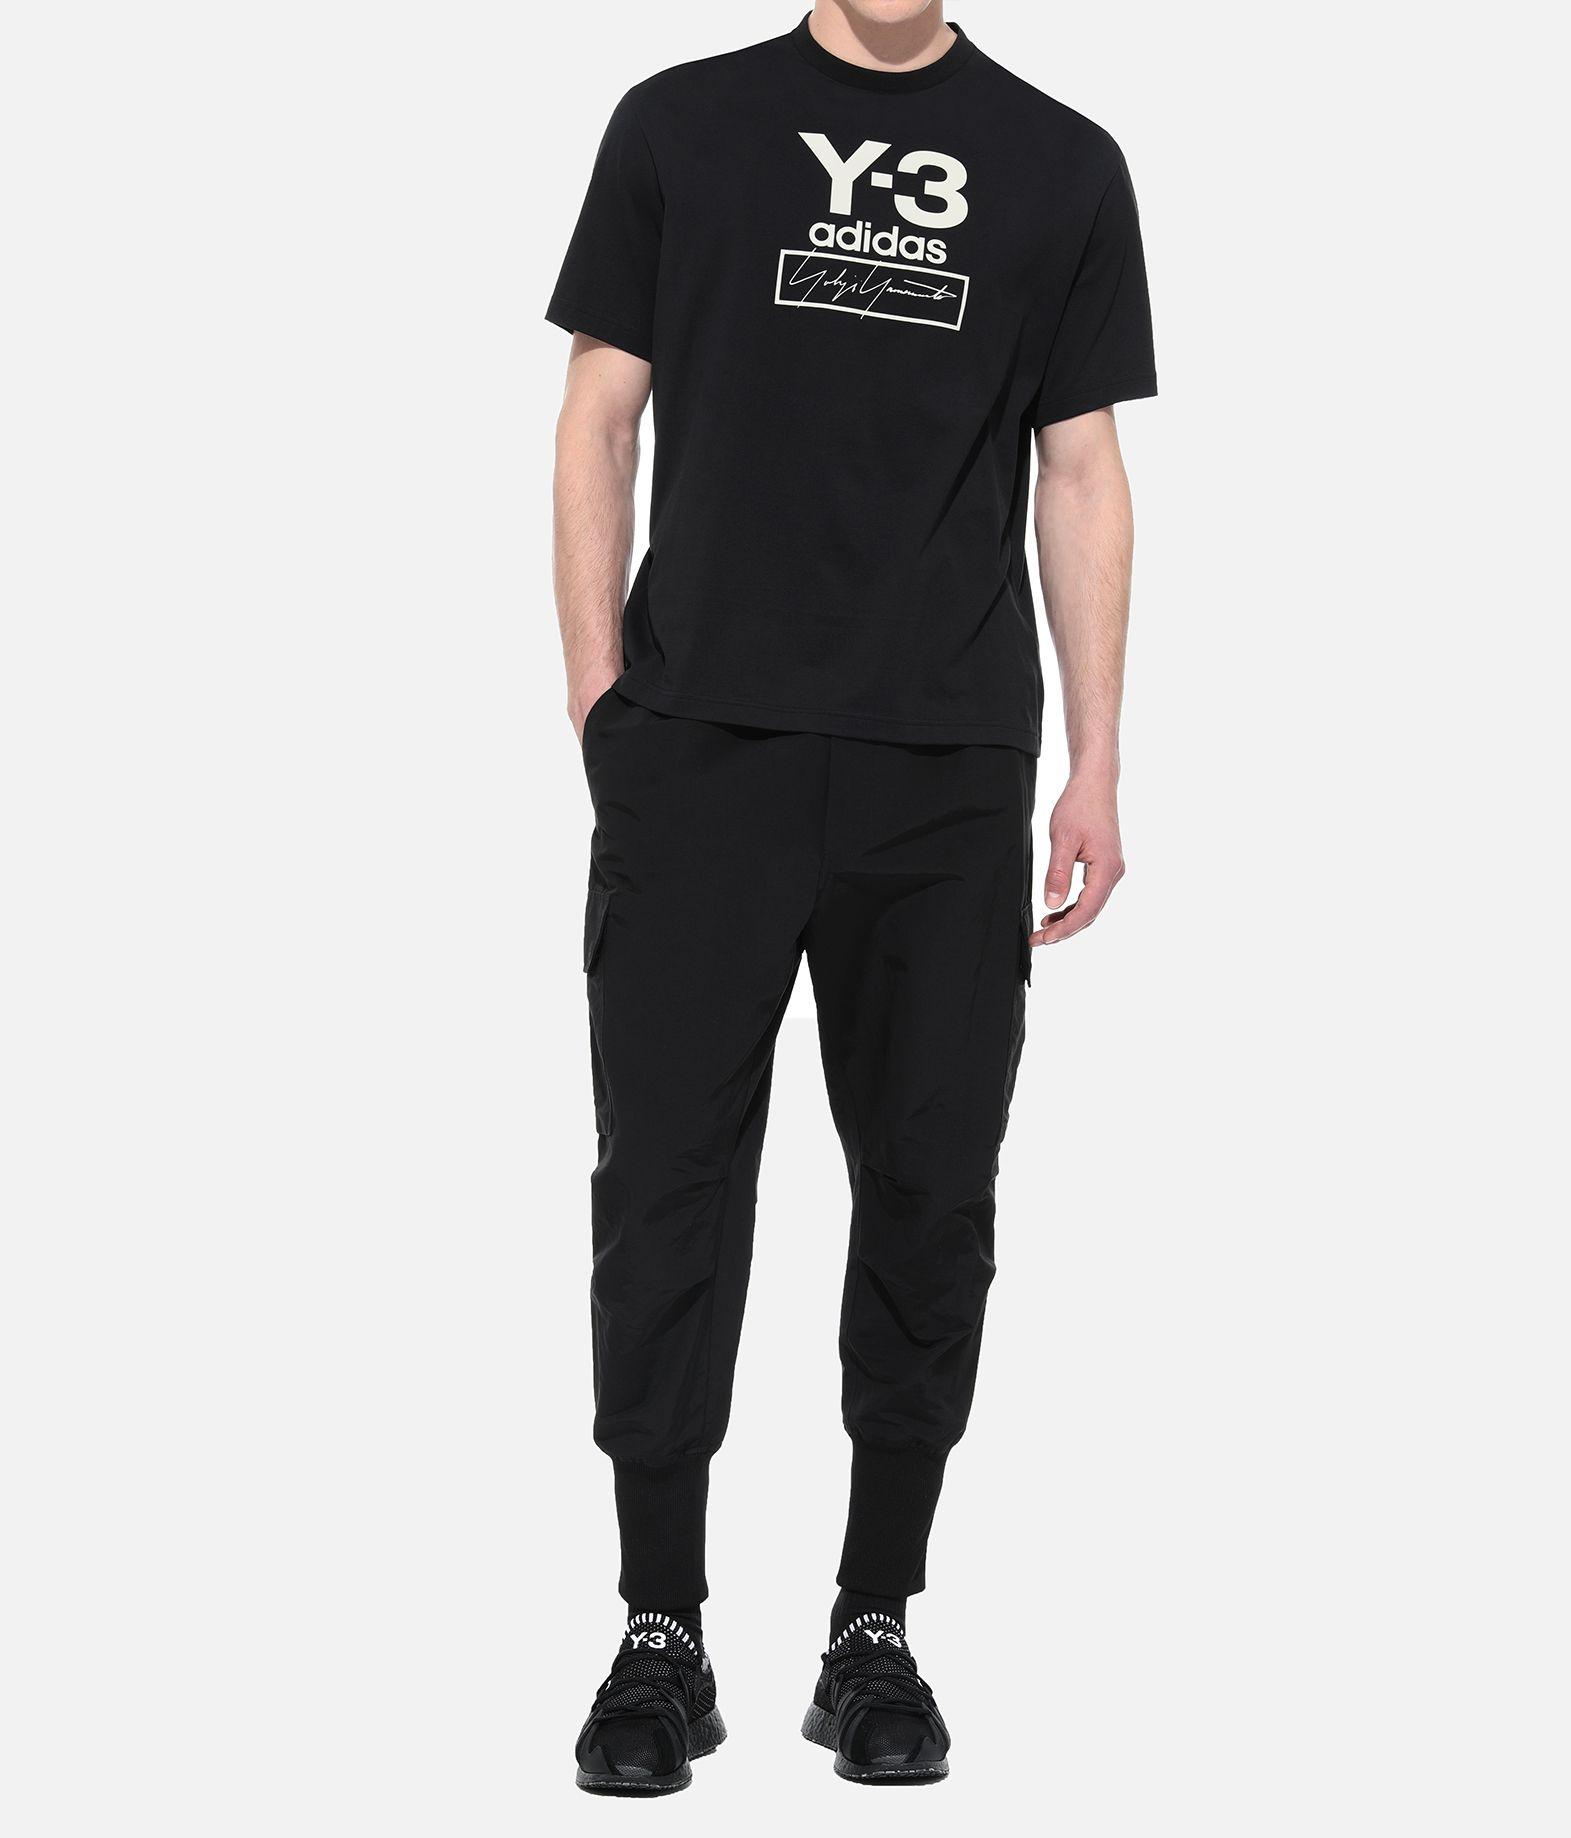 Y-3 Y-3 Nylon Cargo Pants パンツ メンズ a